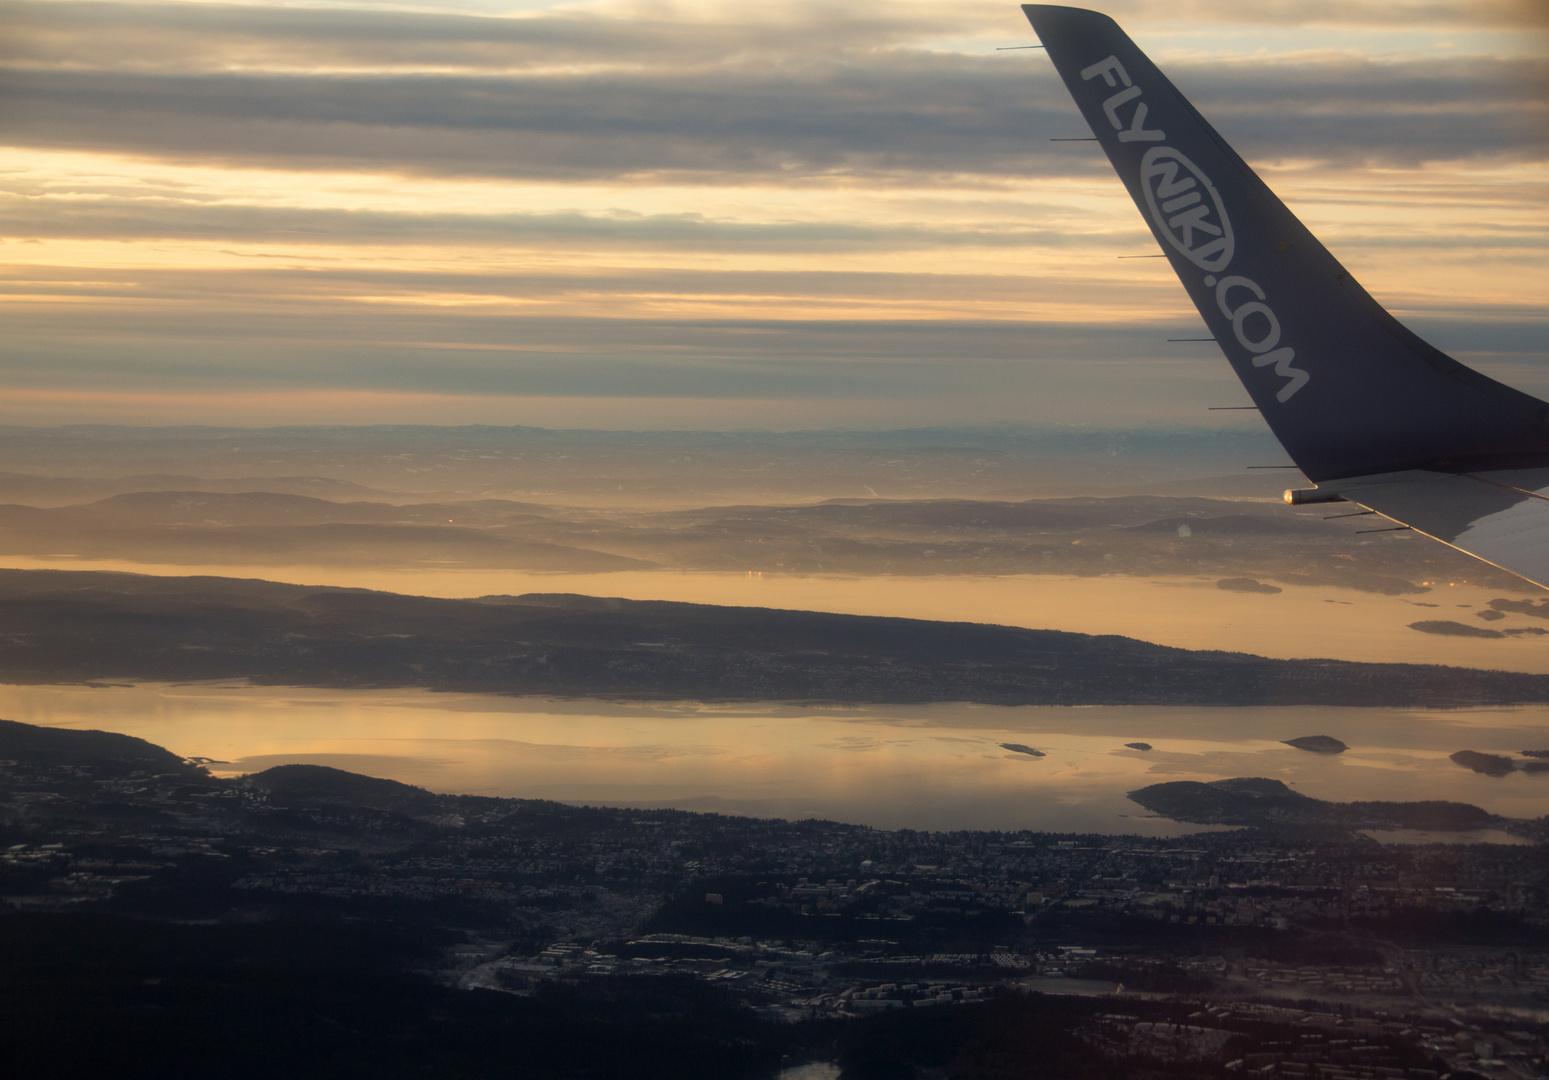 Anflug auf Oslo